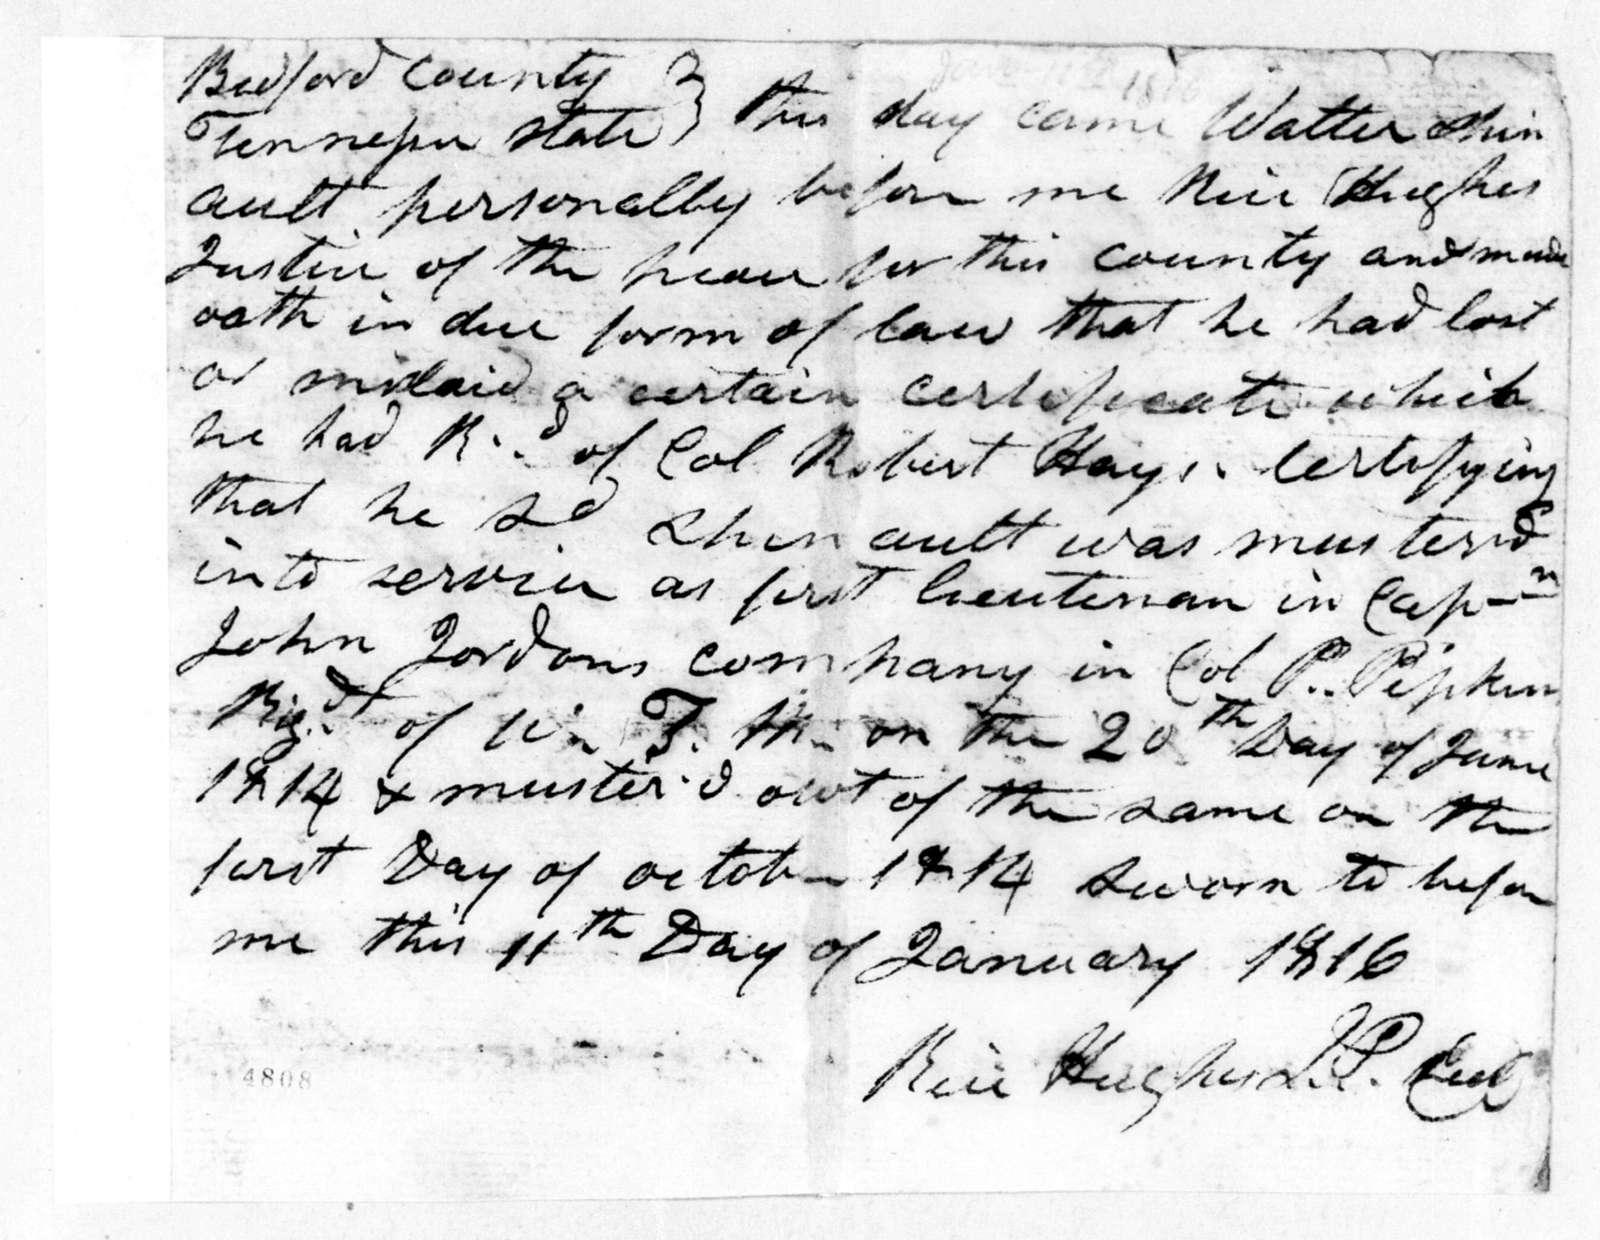 J. Hughes, January 11, 1816